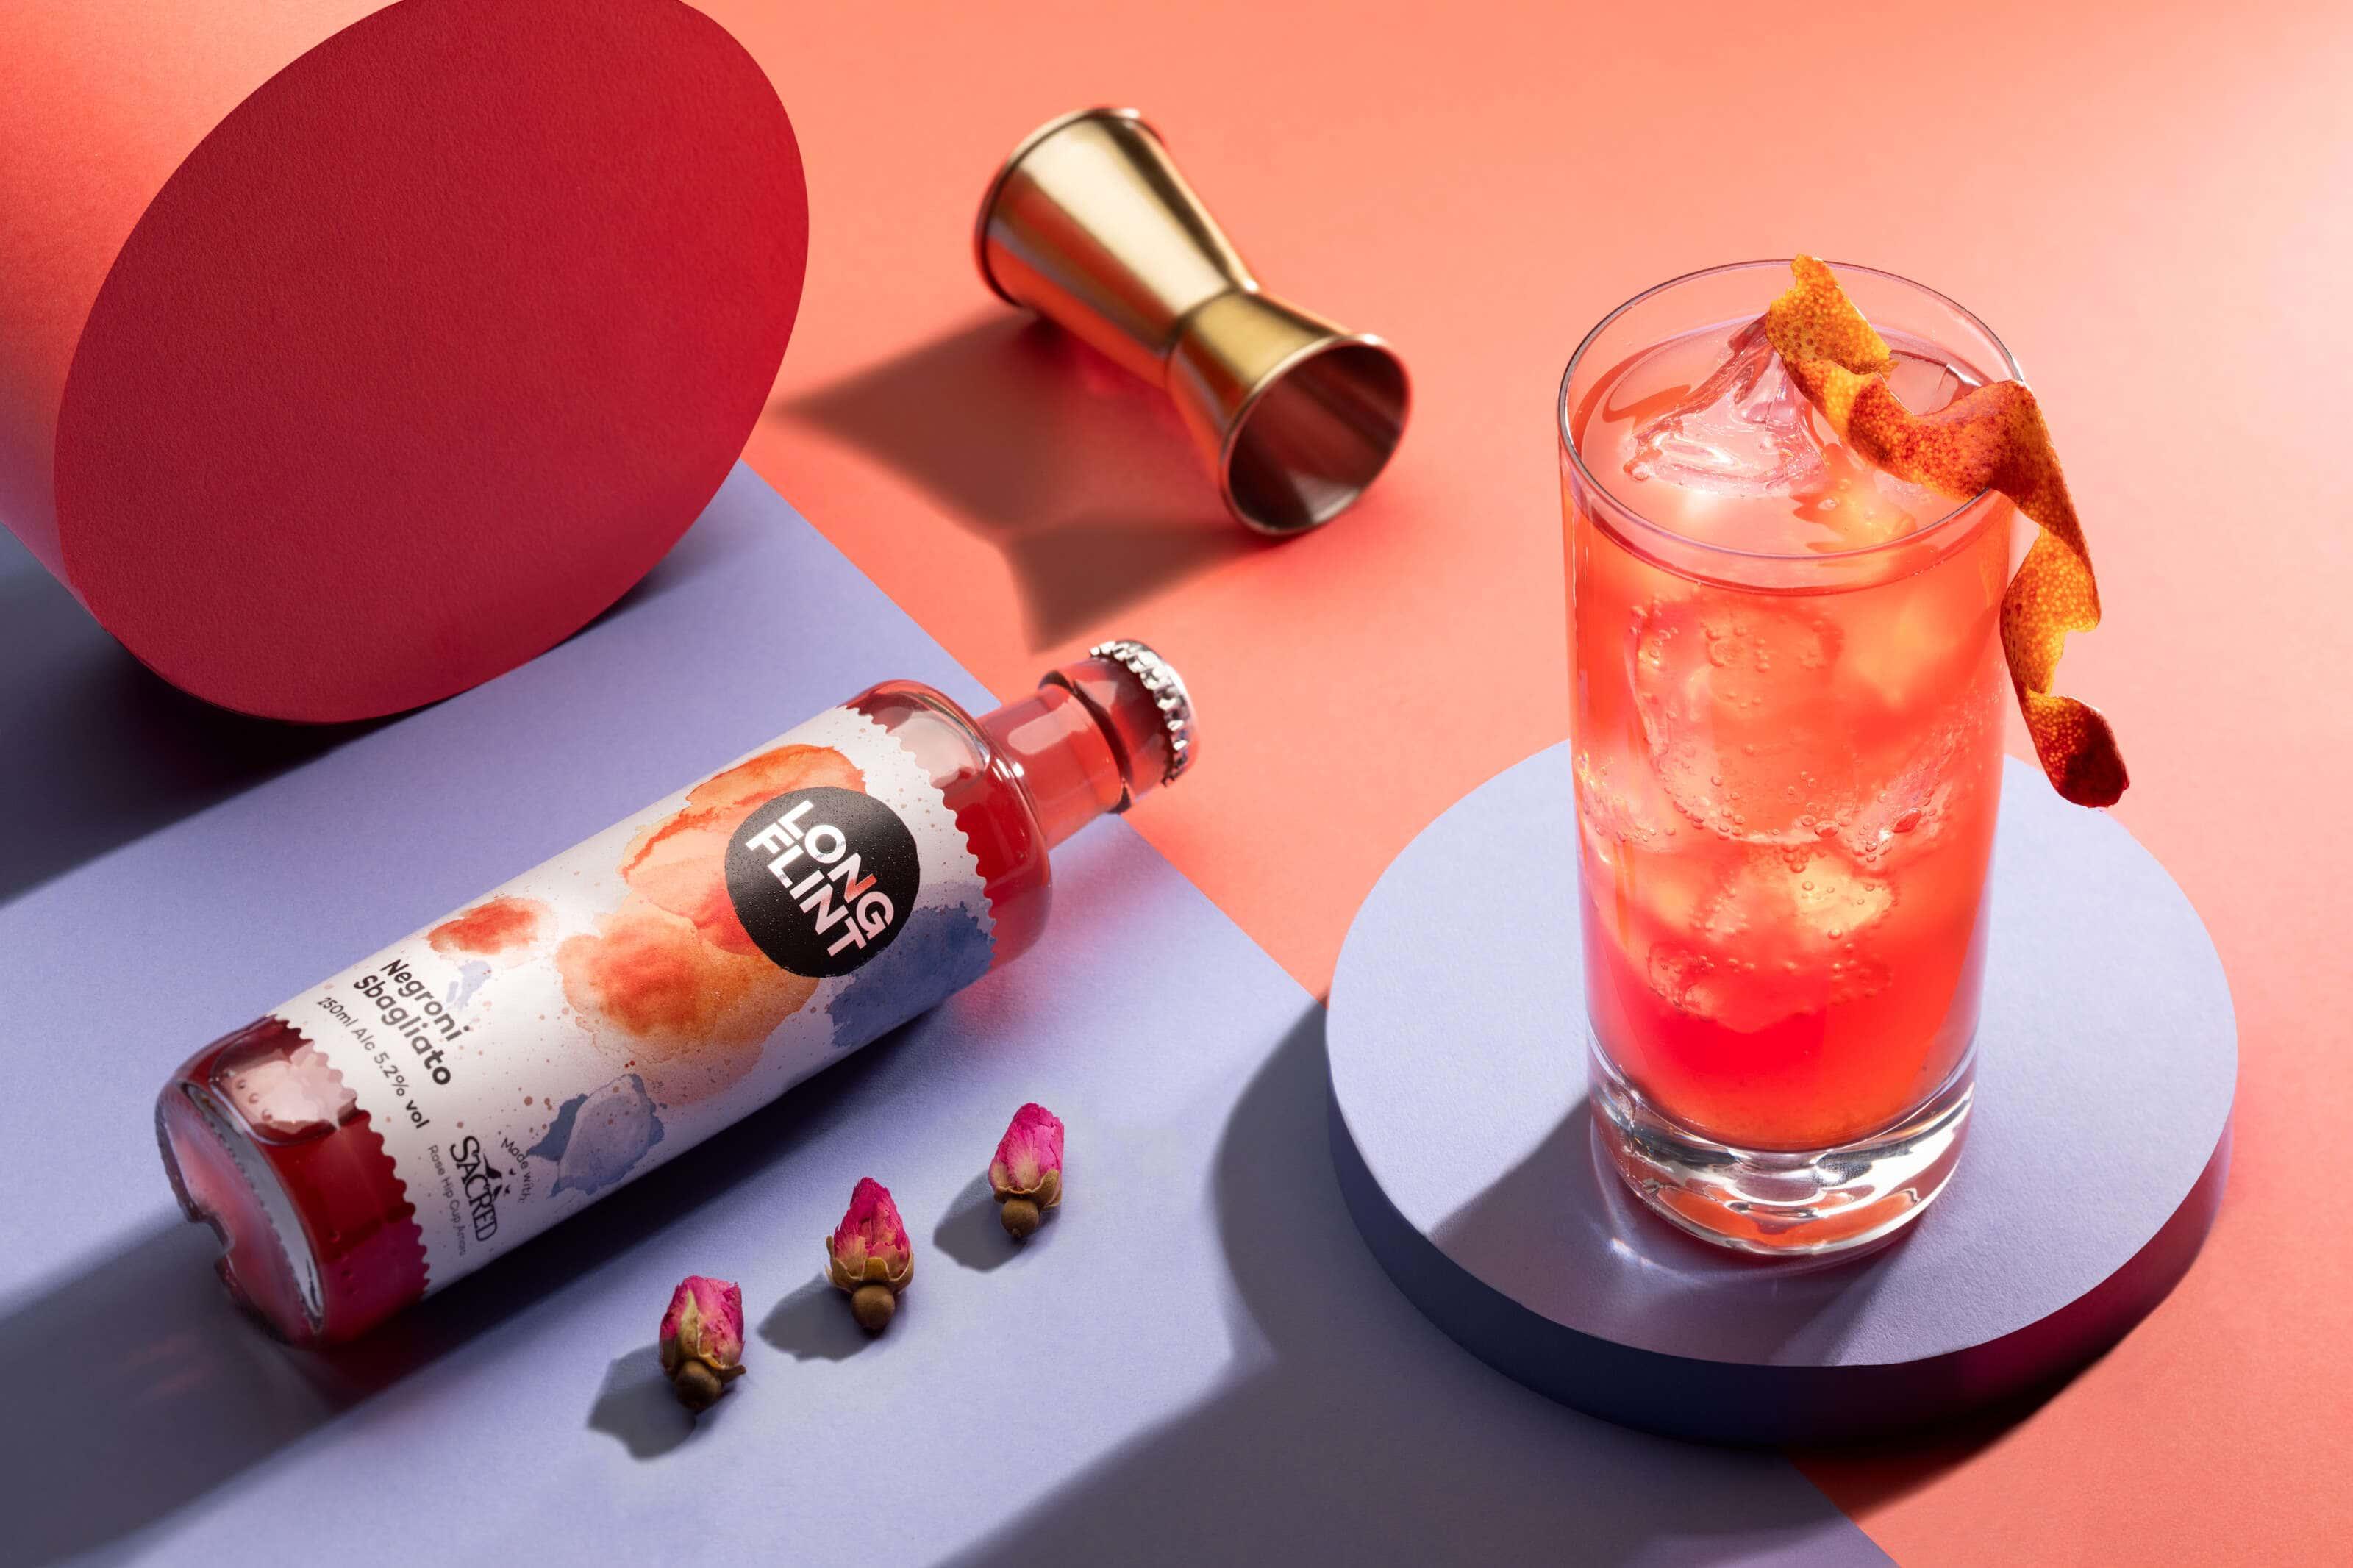 long-flint-negroni-cocktail-in-a-pop-art-style